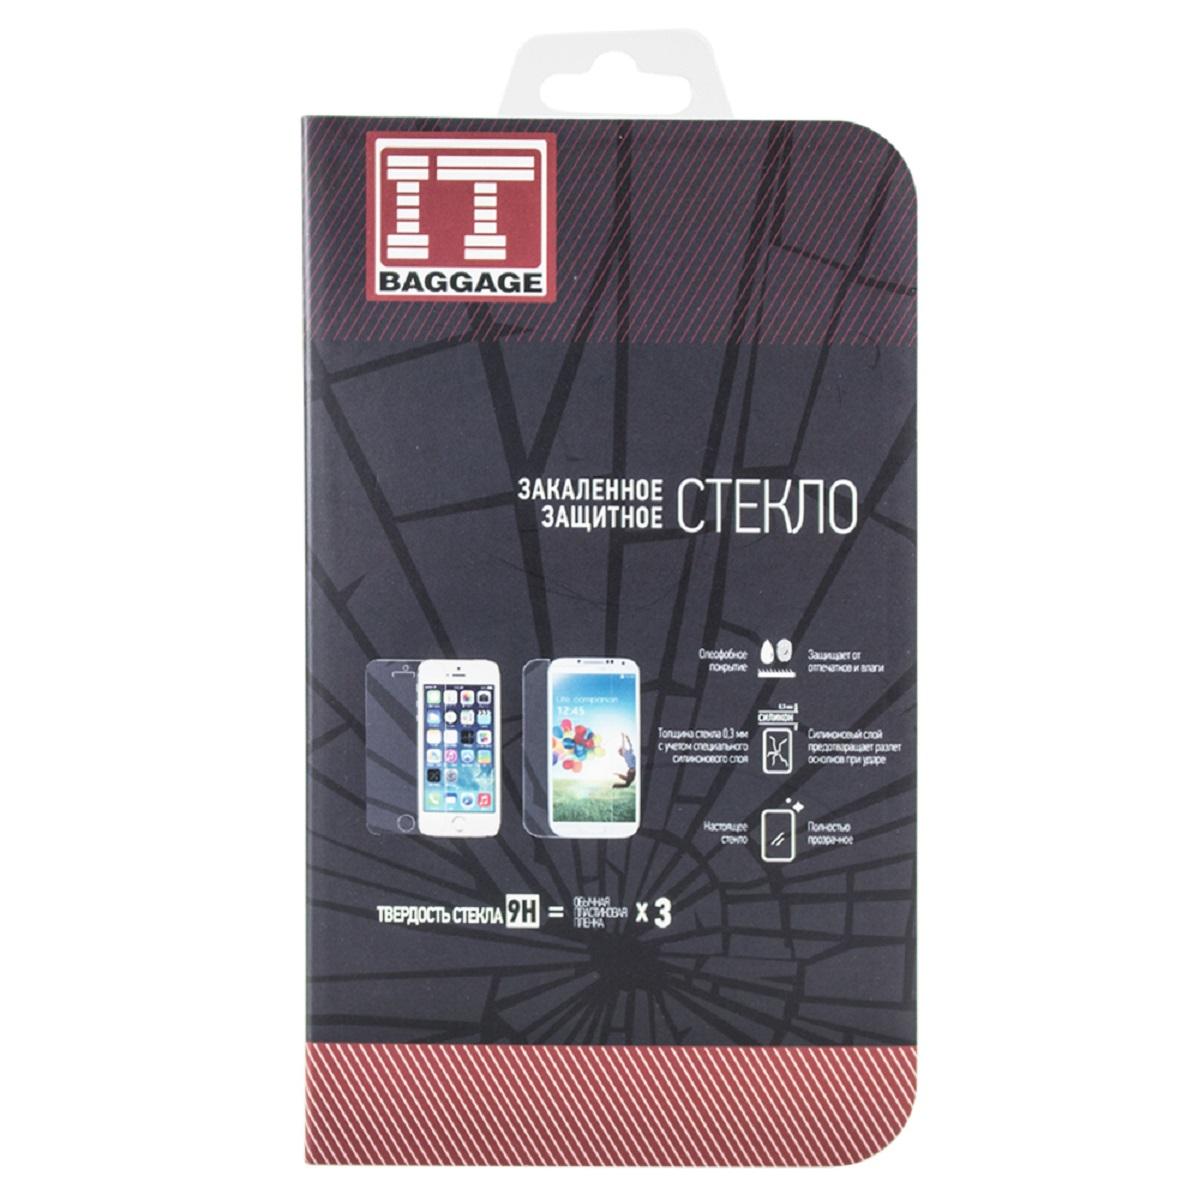 IT Baggage защитное стекло для Meizu M3s mini - Защитные стекла и пленки